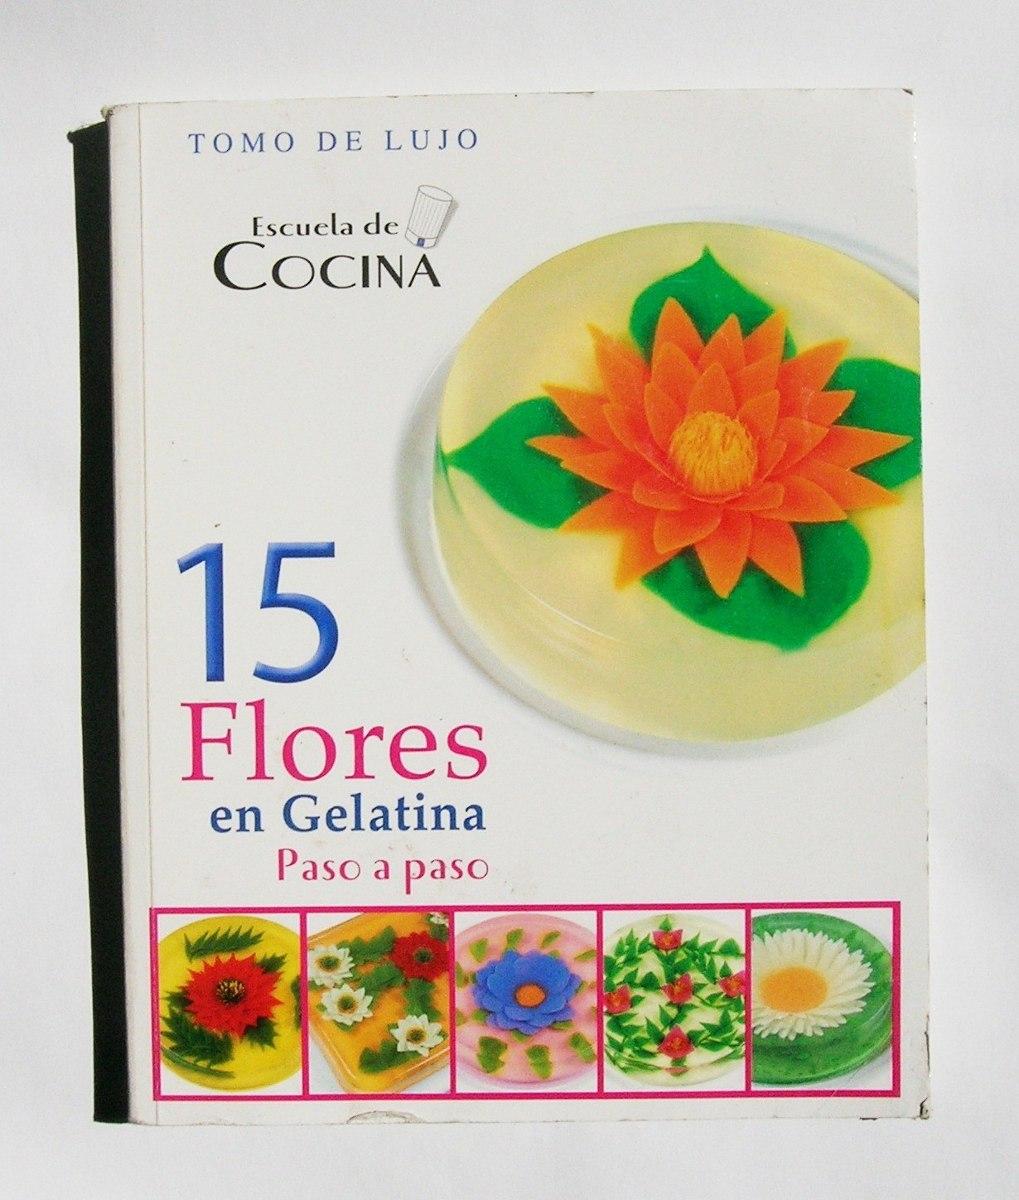 15 flores en gelatina escuela de cocina libro mexicano - Escuela de cocina ...